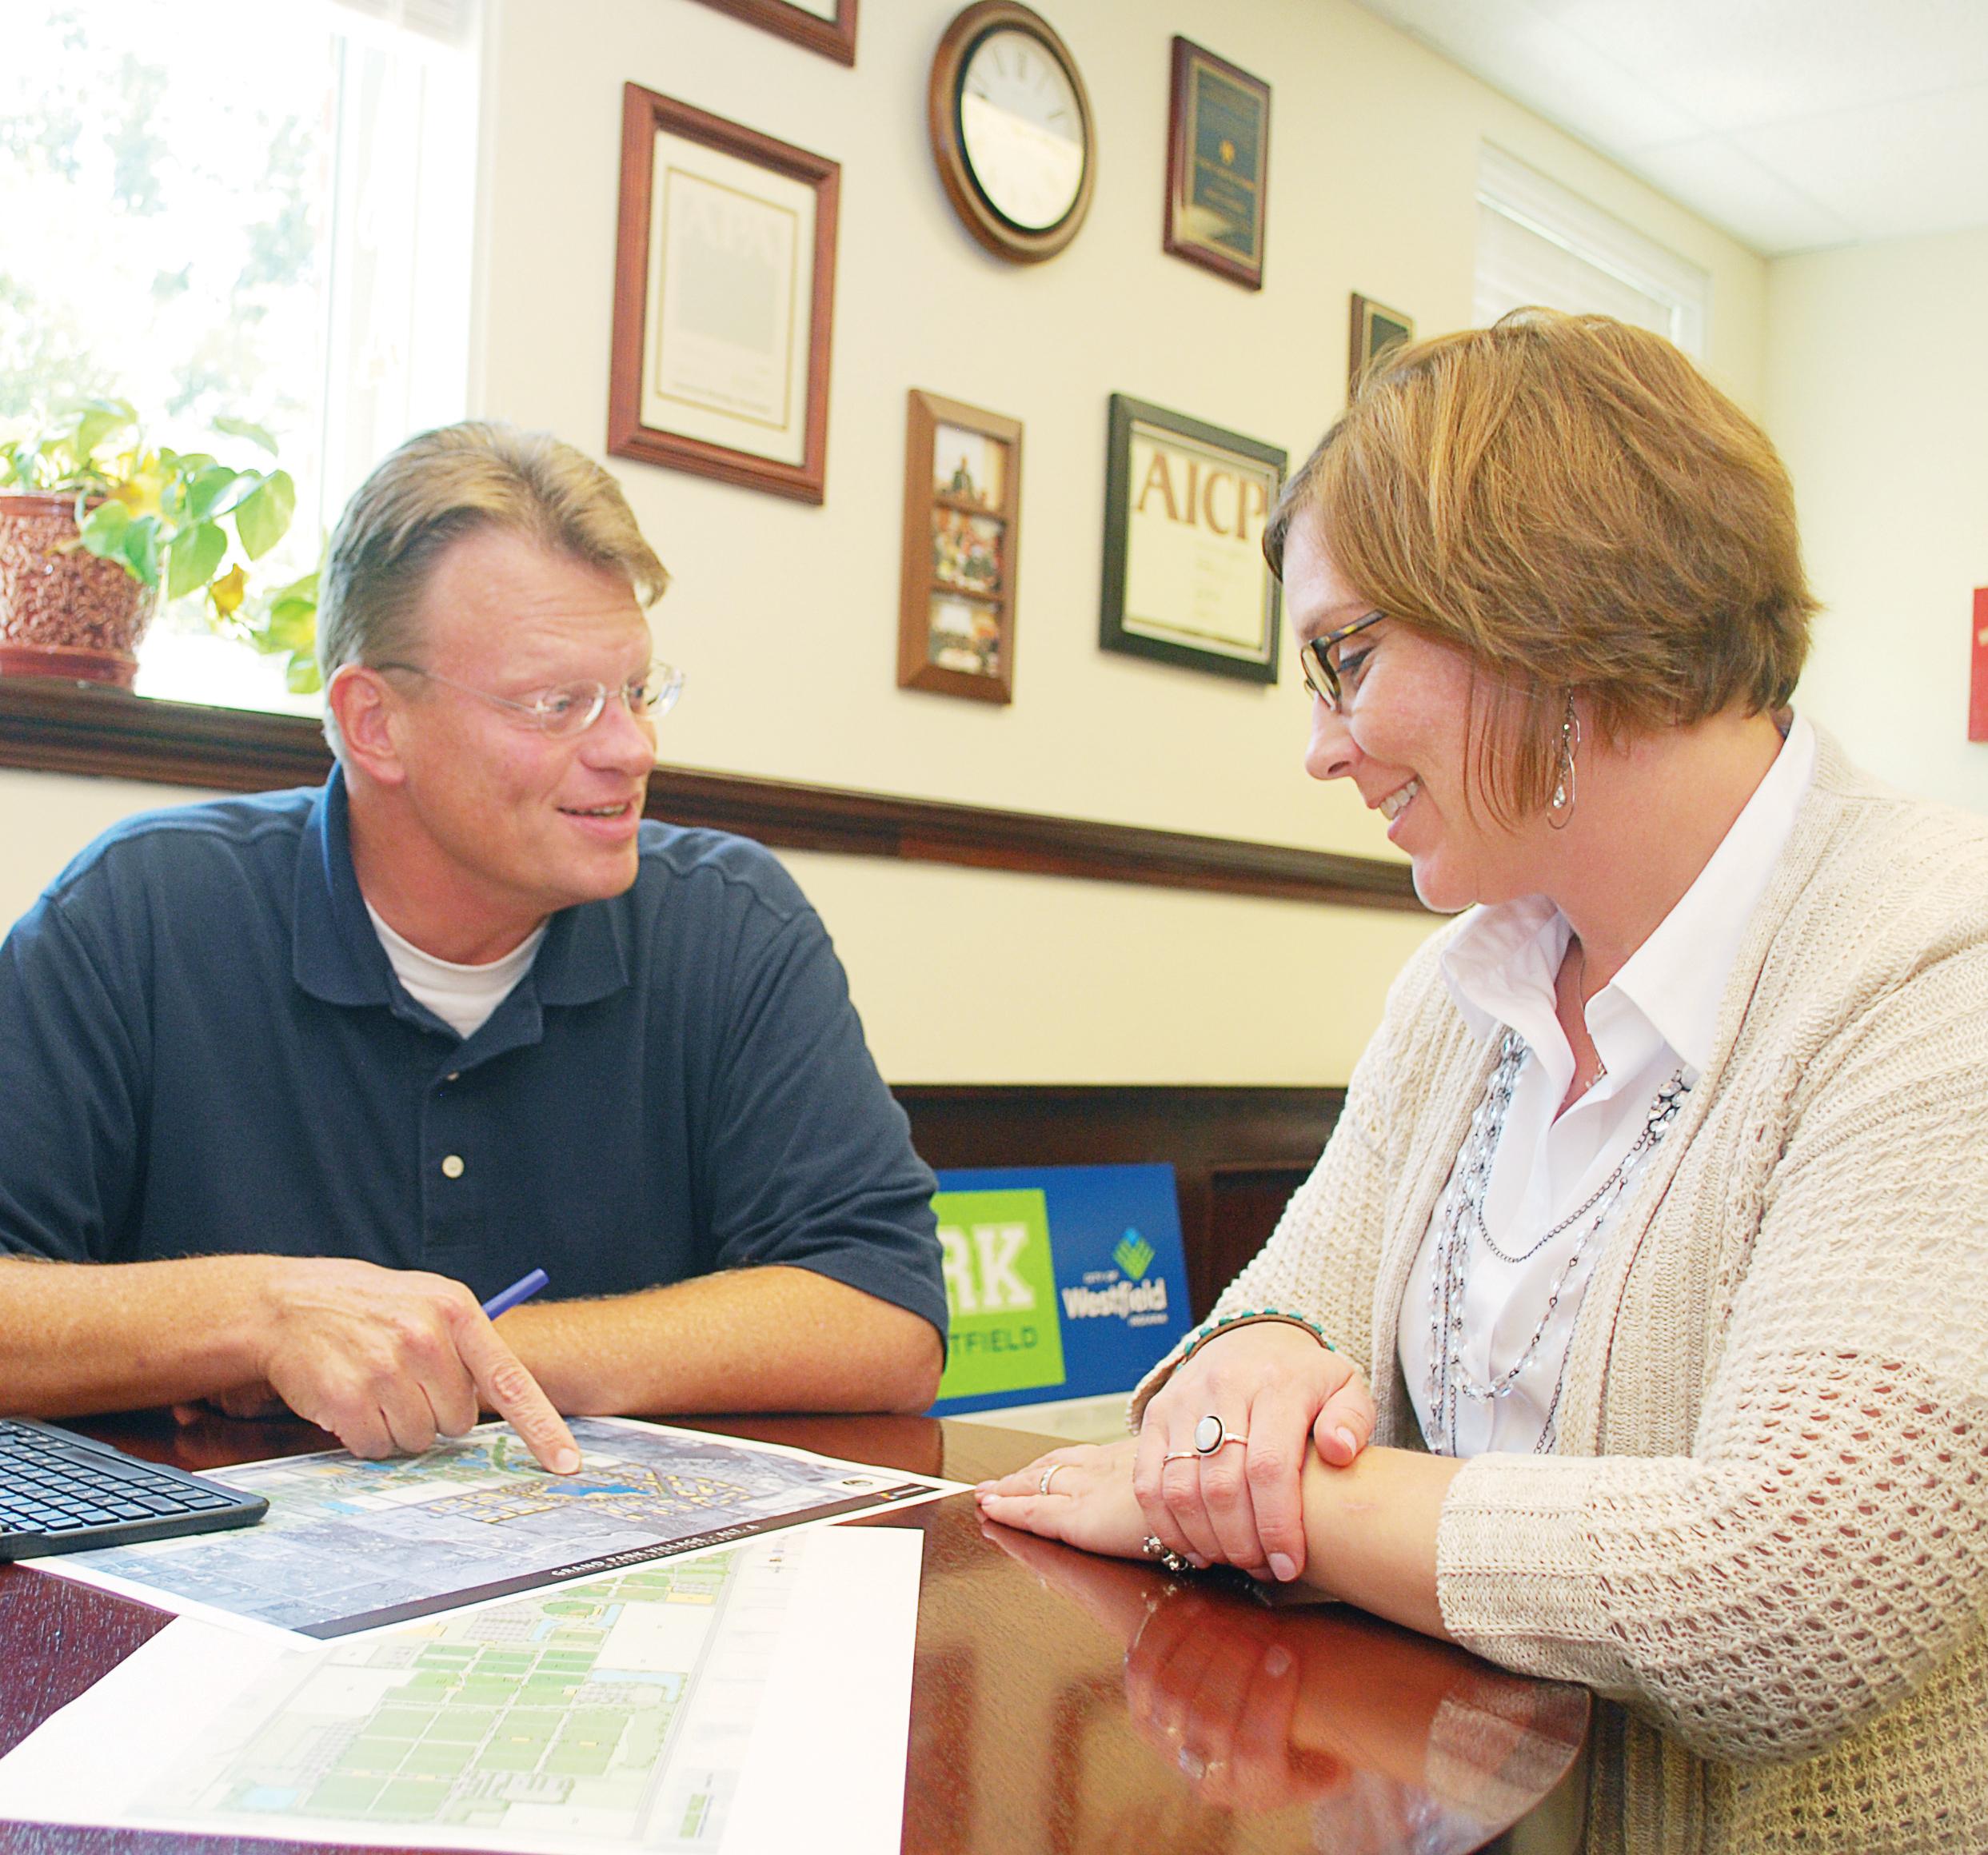 Westfield Economic and Community Development Director Matt Skelton looks over plans with Assistant Director Jennifer Miller in his office. (Photo by Robert Herrington)